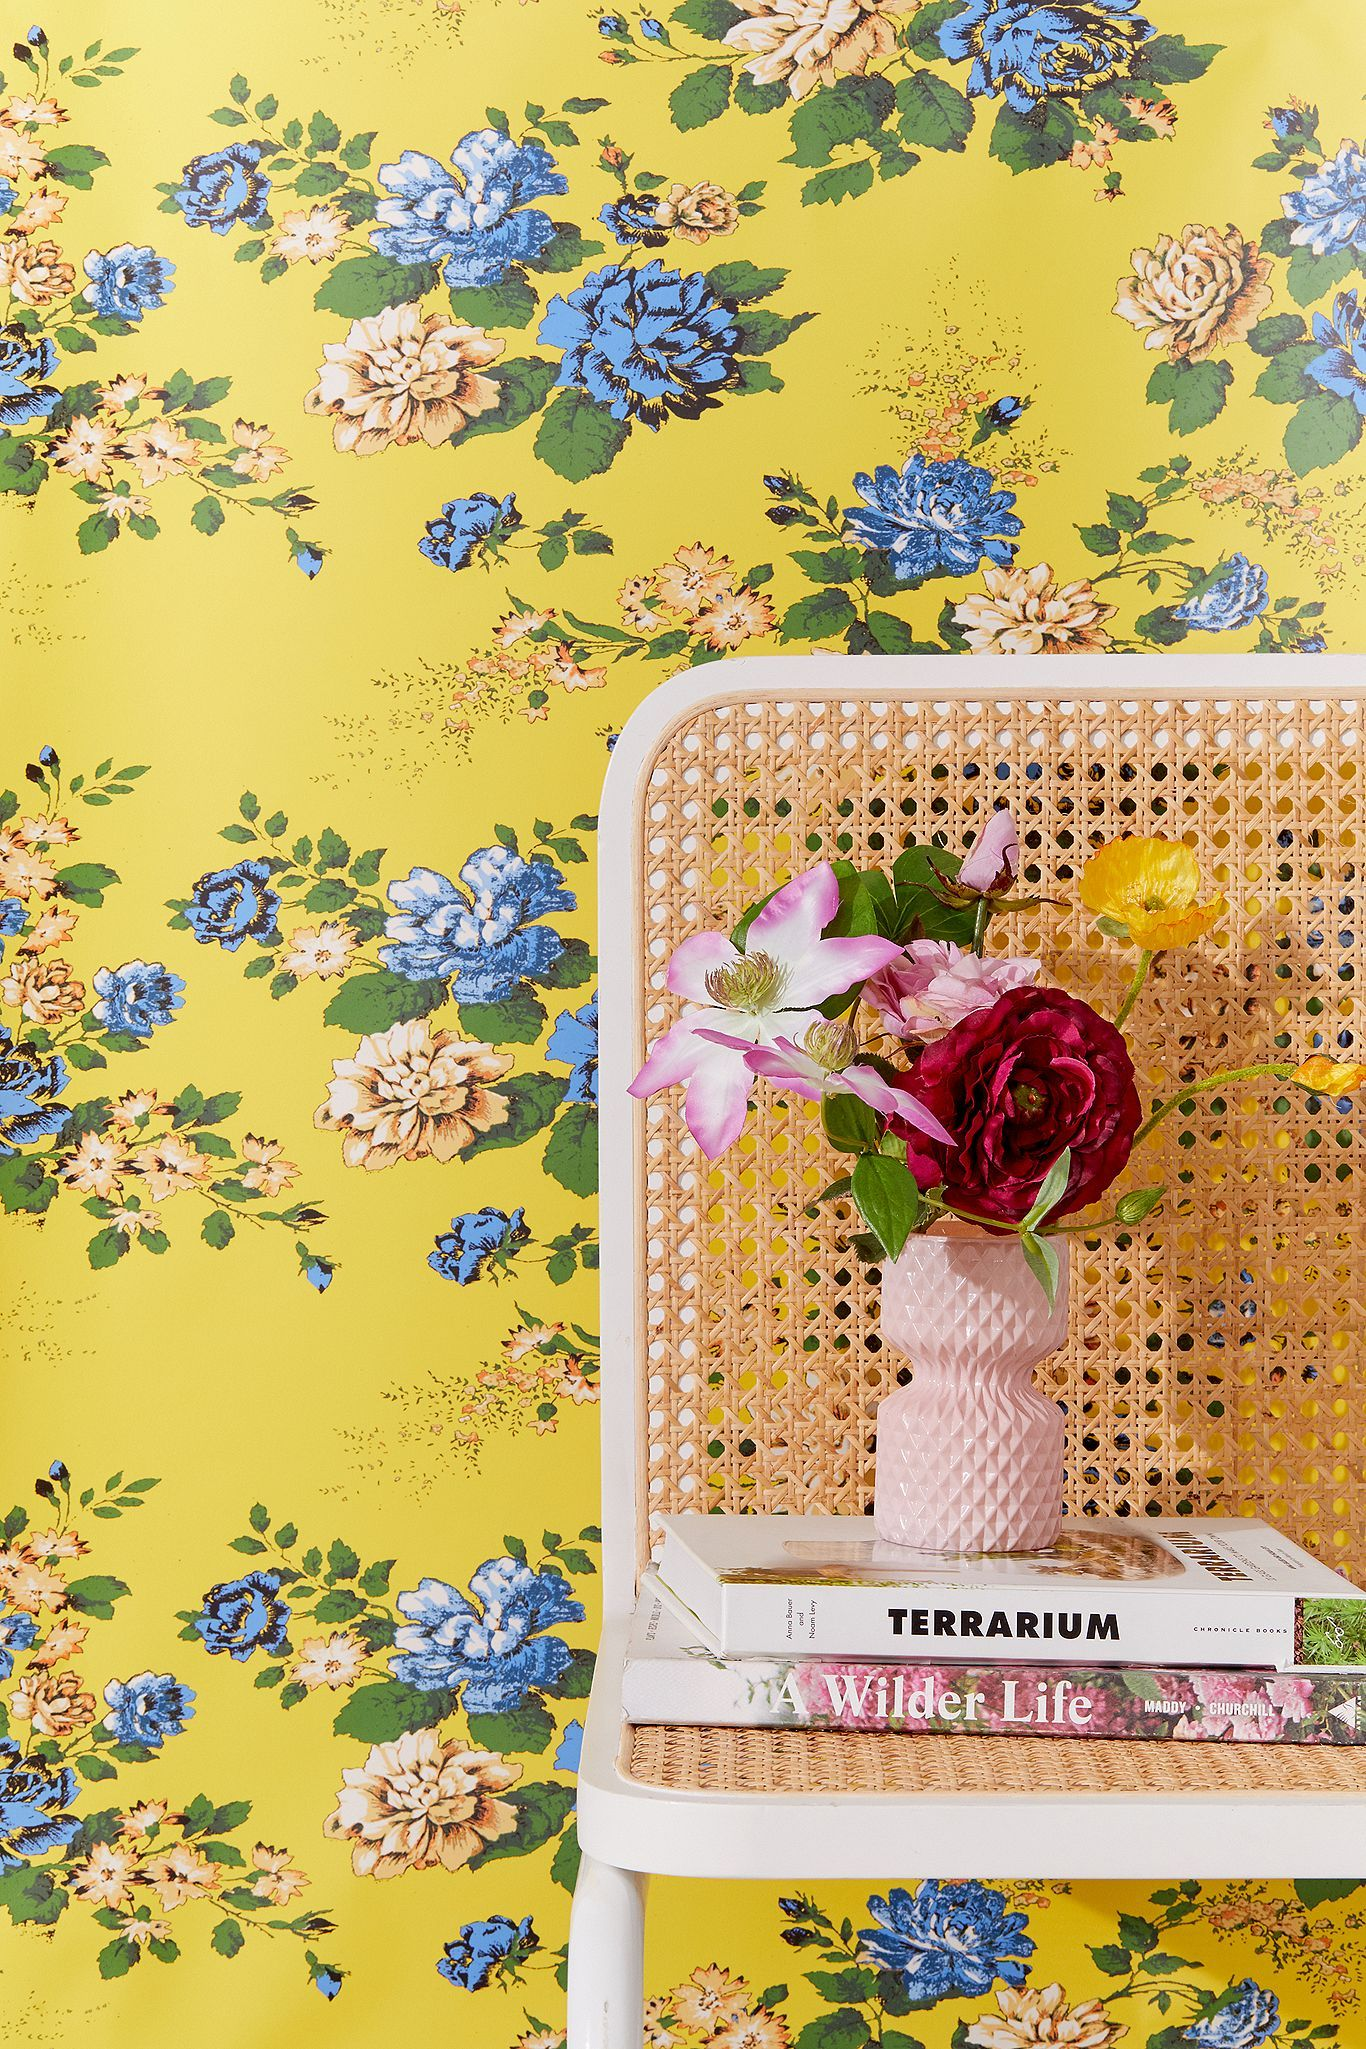 Petra Floral Removable Wallpaper Urban Outfitters Uk In 2020 Removable Wallpaper Stick On Wallpaper Urban Outfitters Wallpaper